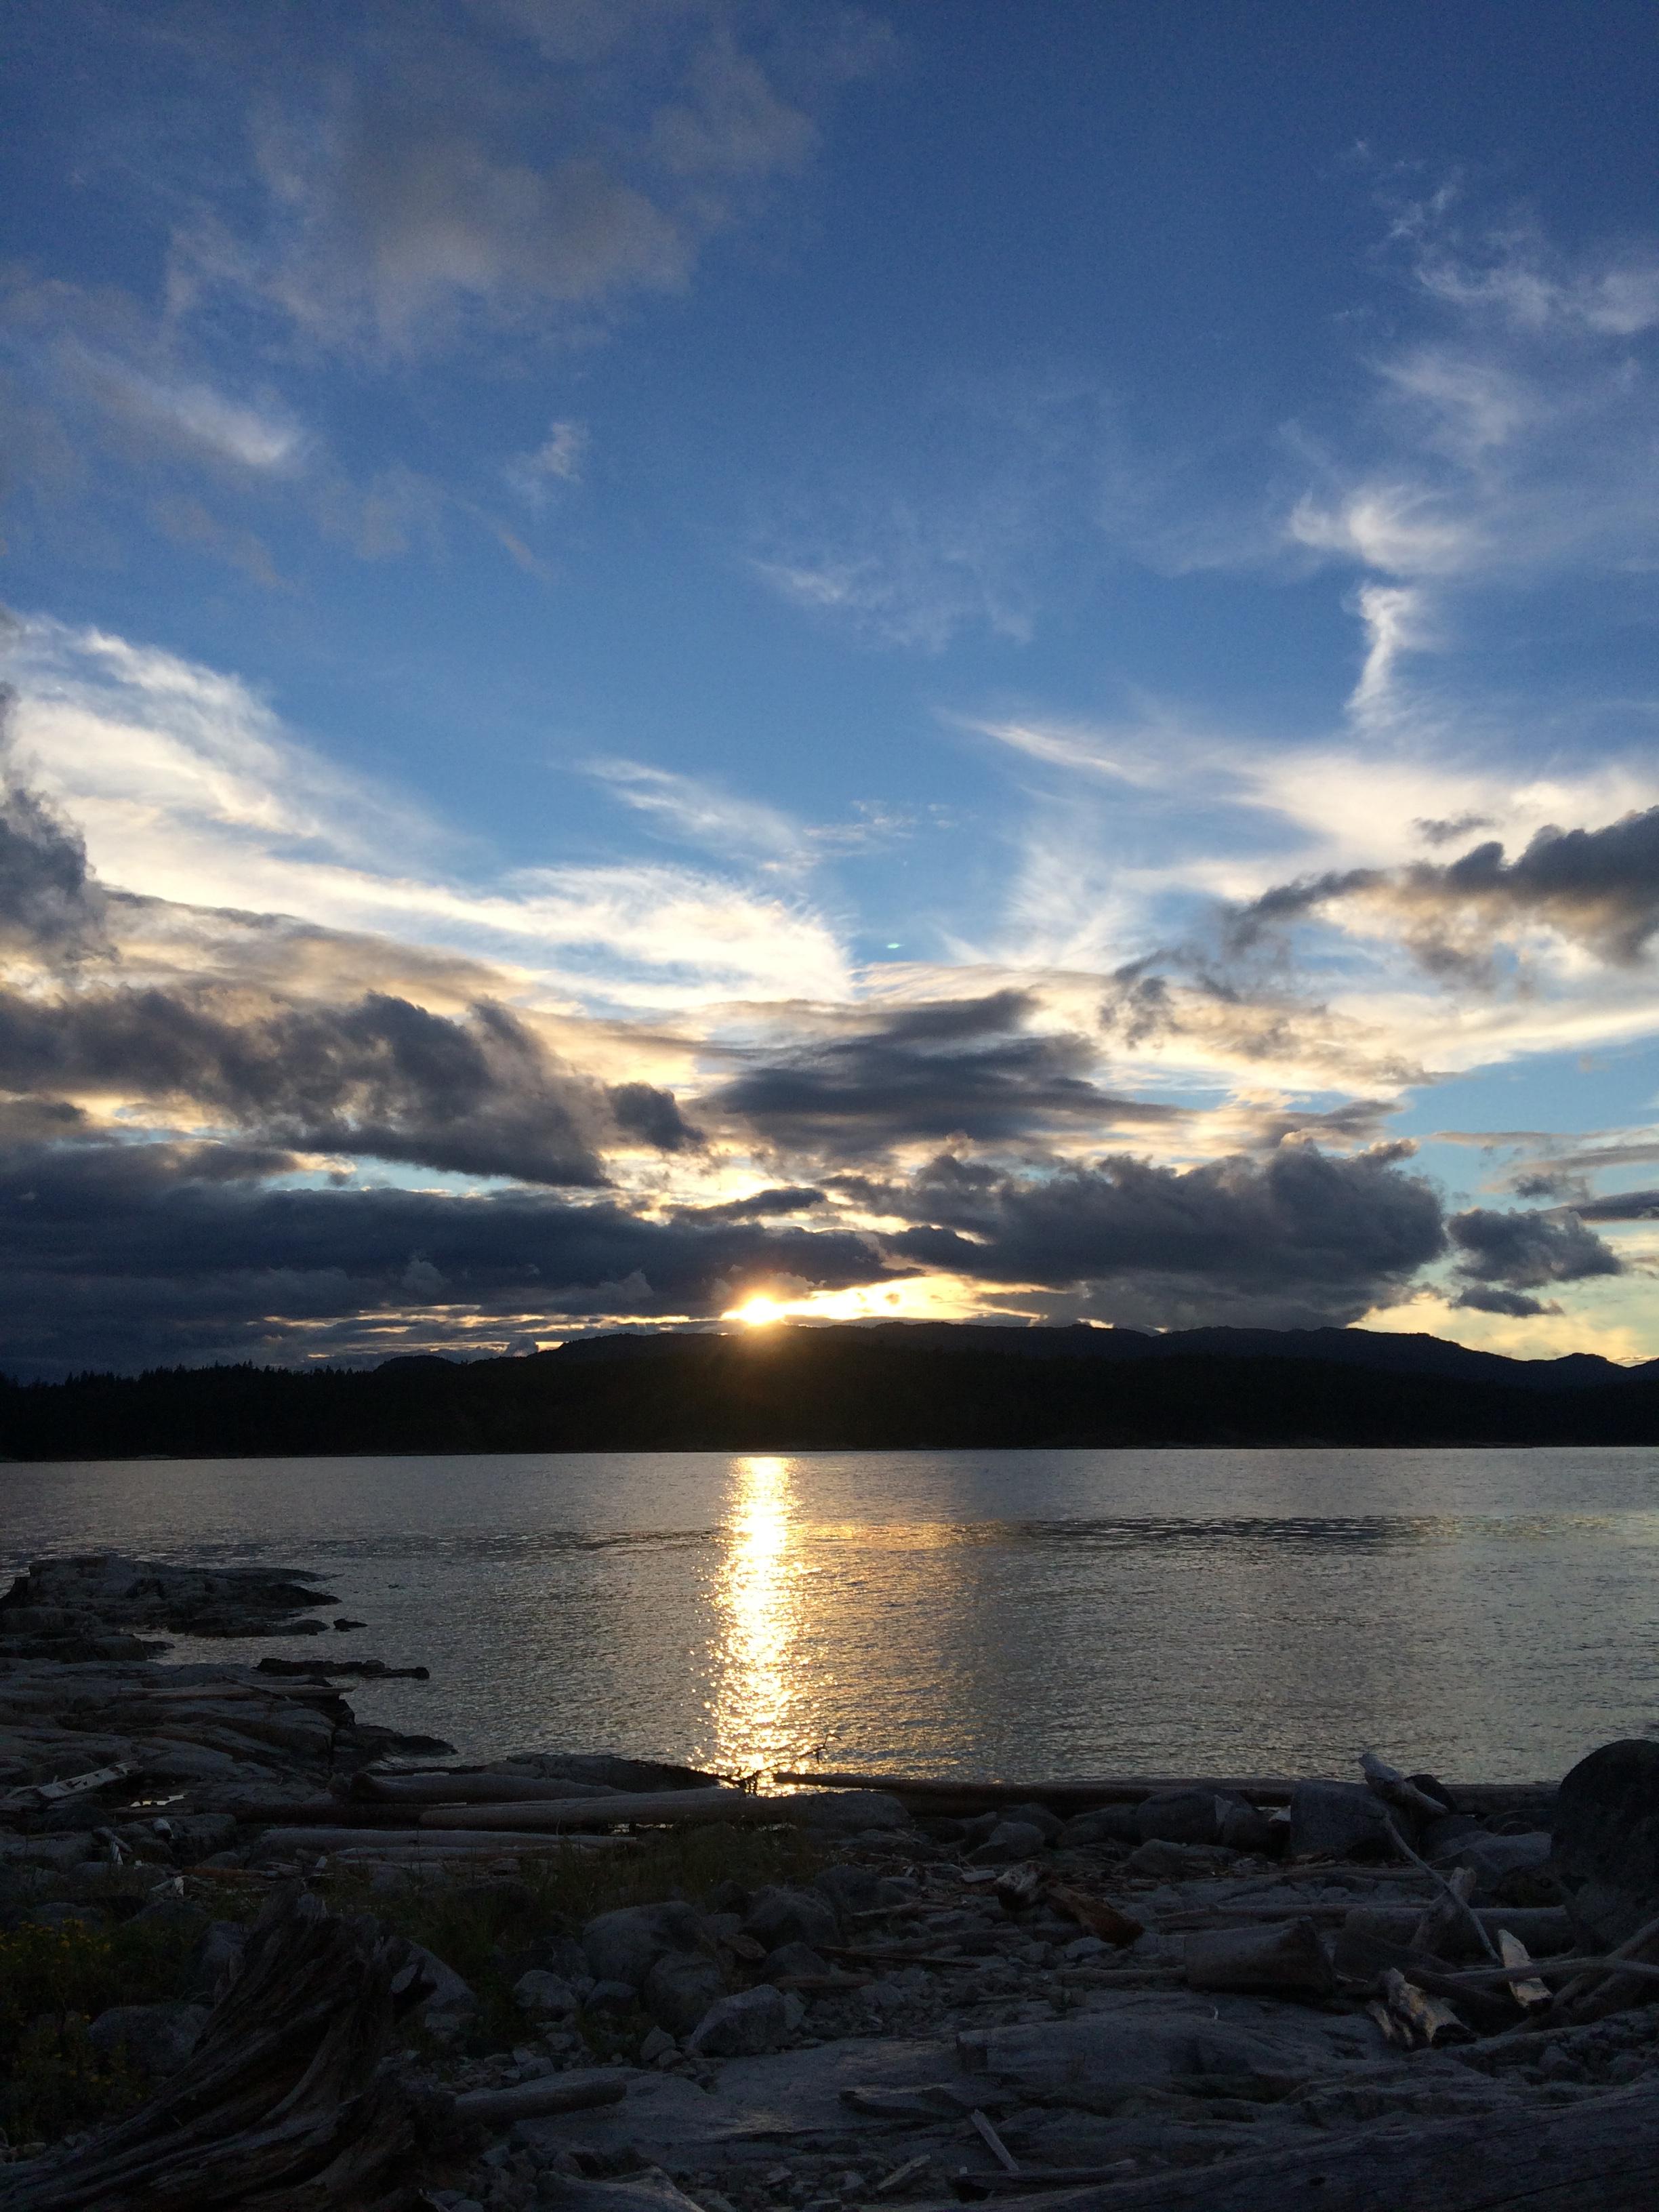 Sunset viewed from Breton Islands